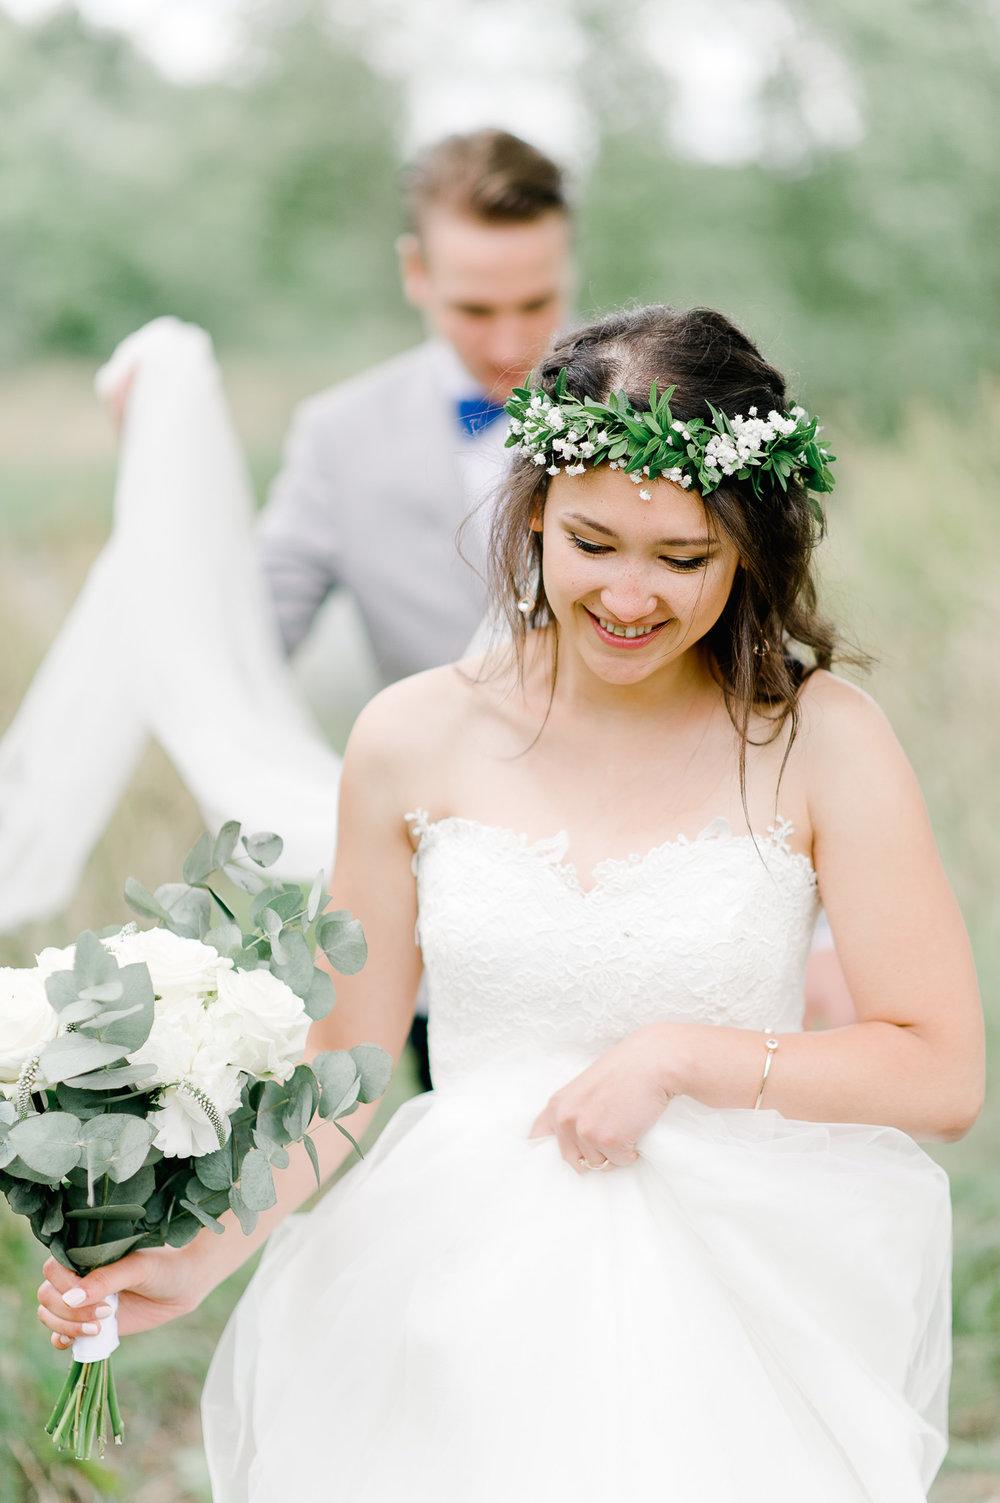 Anna_Hari_Wedding_Photography-46.jpg